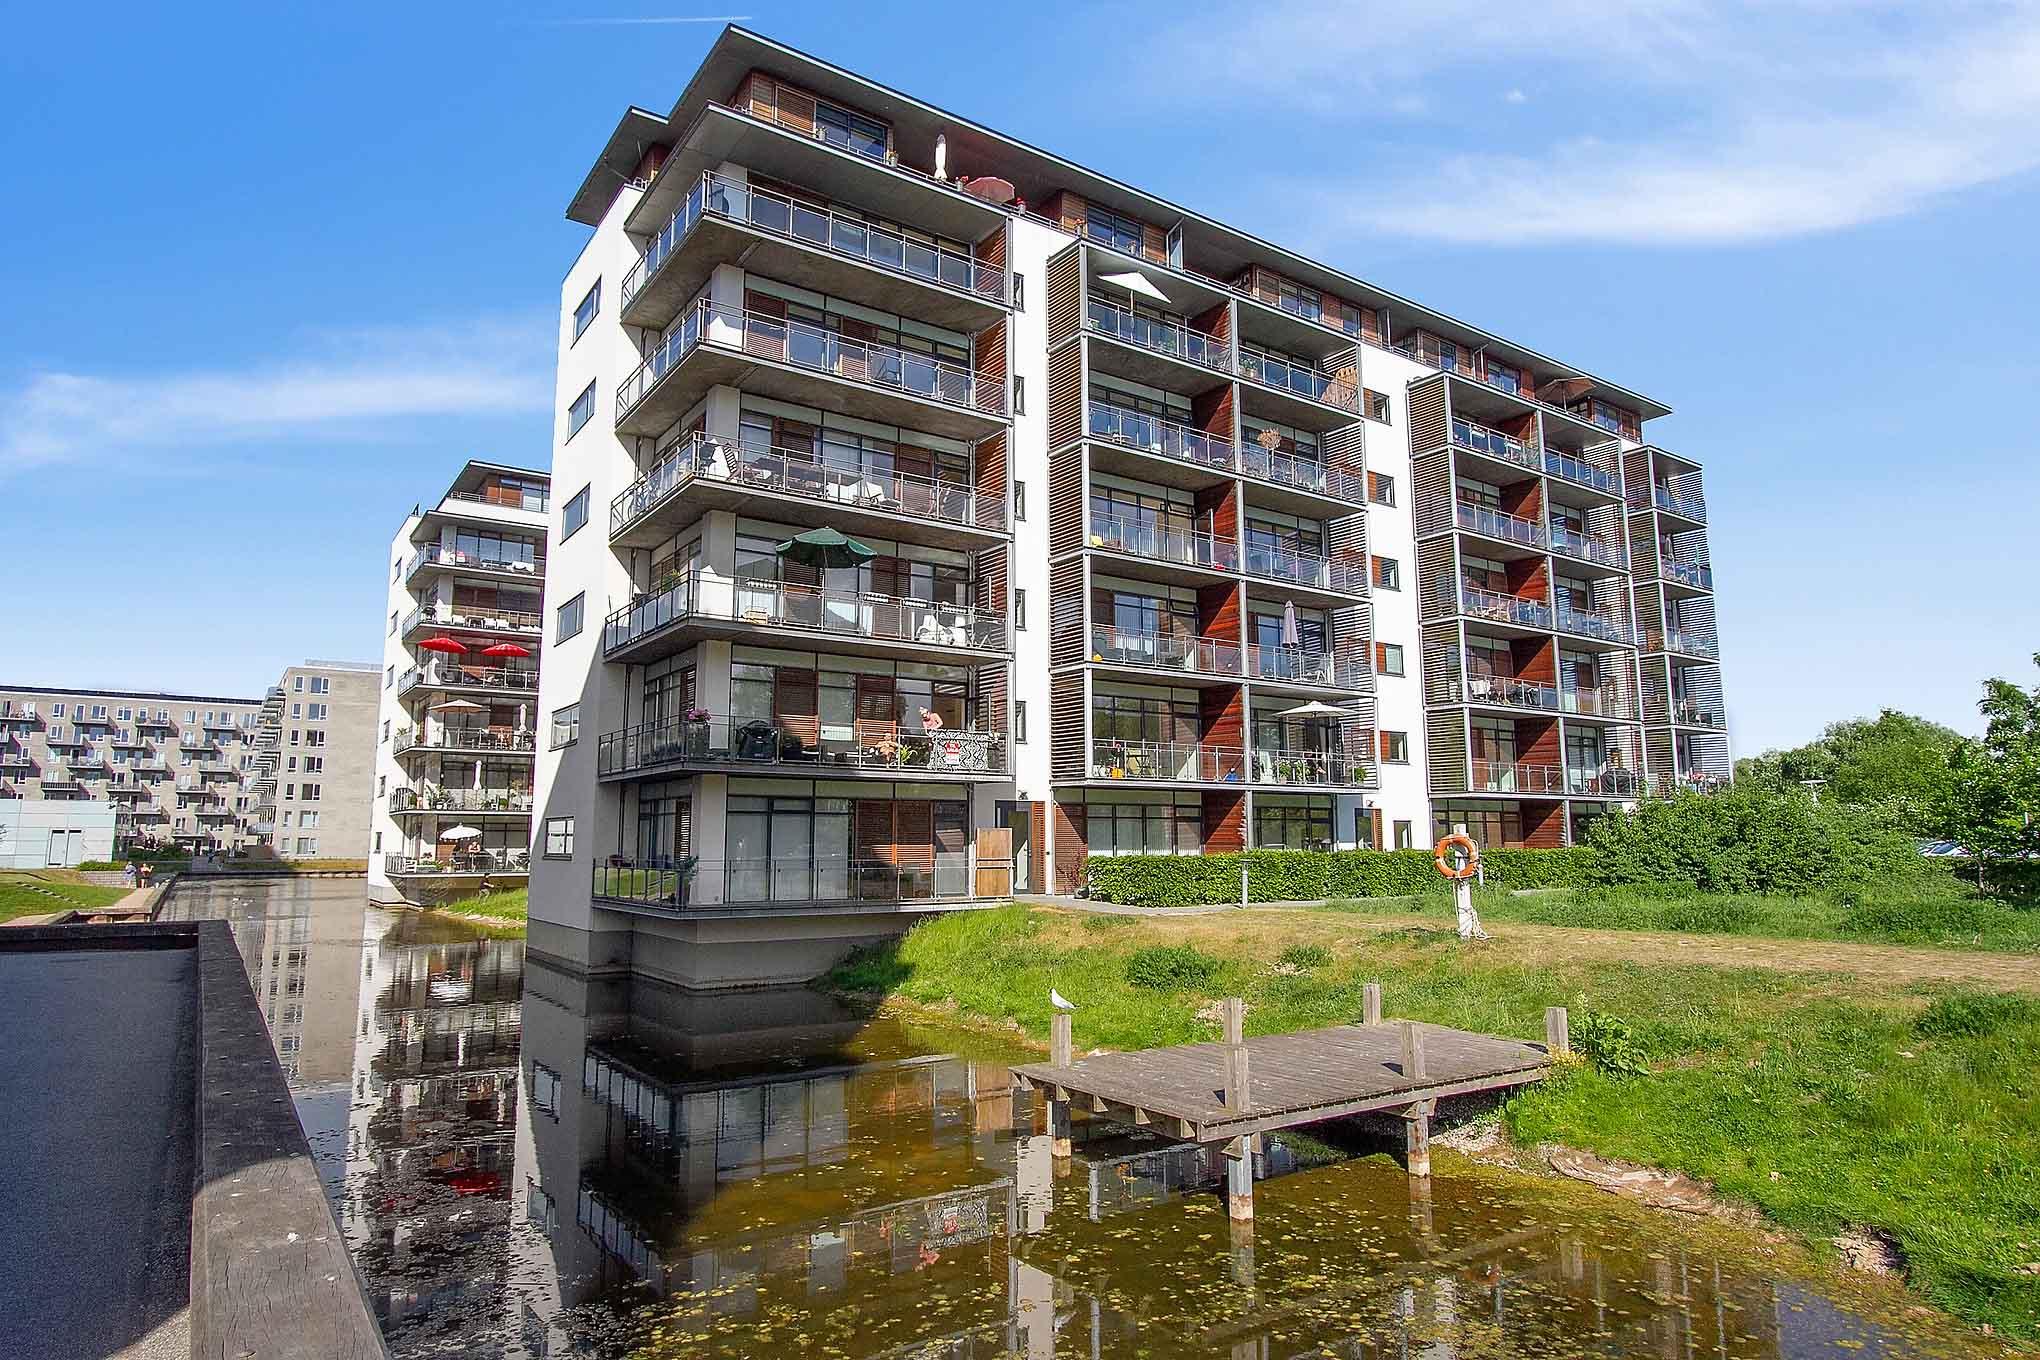 Lejebolig på Gyngemose Parkvej 3, 4. tv., 2860 Søborg